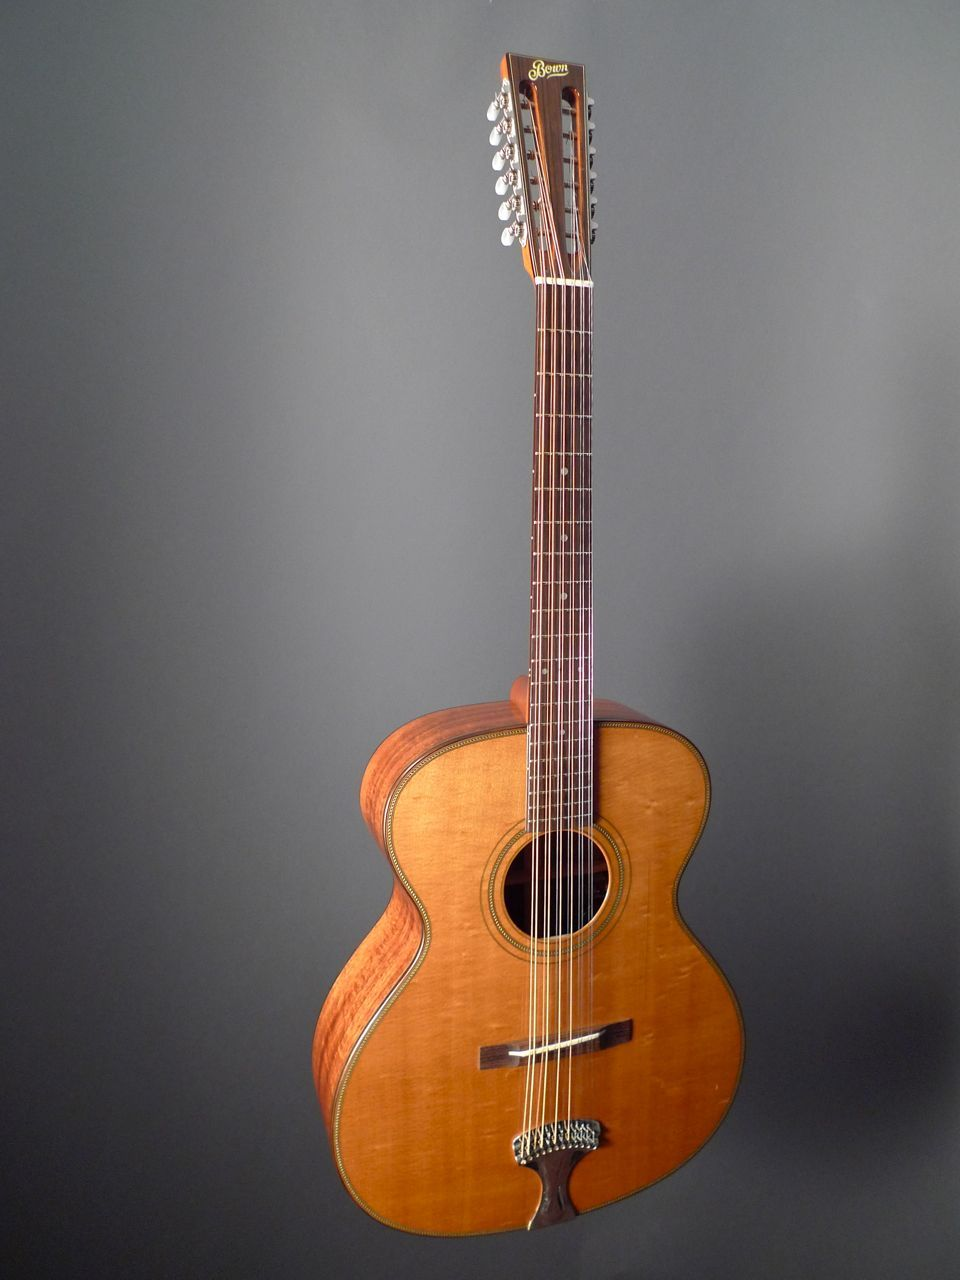 bown stella 12 string acoustic guitar guitars pinterest 12 string acoustic guitar. Black Bedroom Furniture Sets. Home Design Ideas